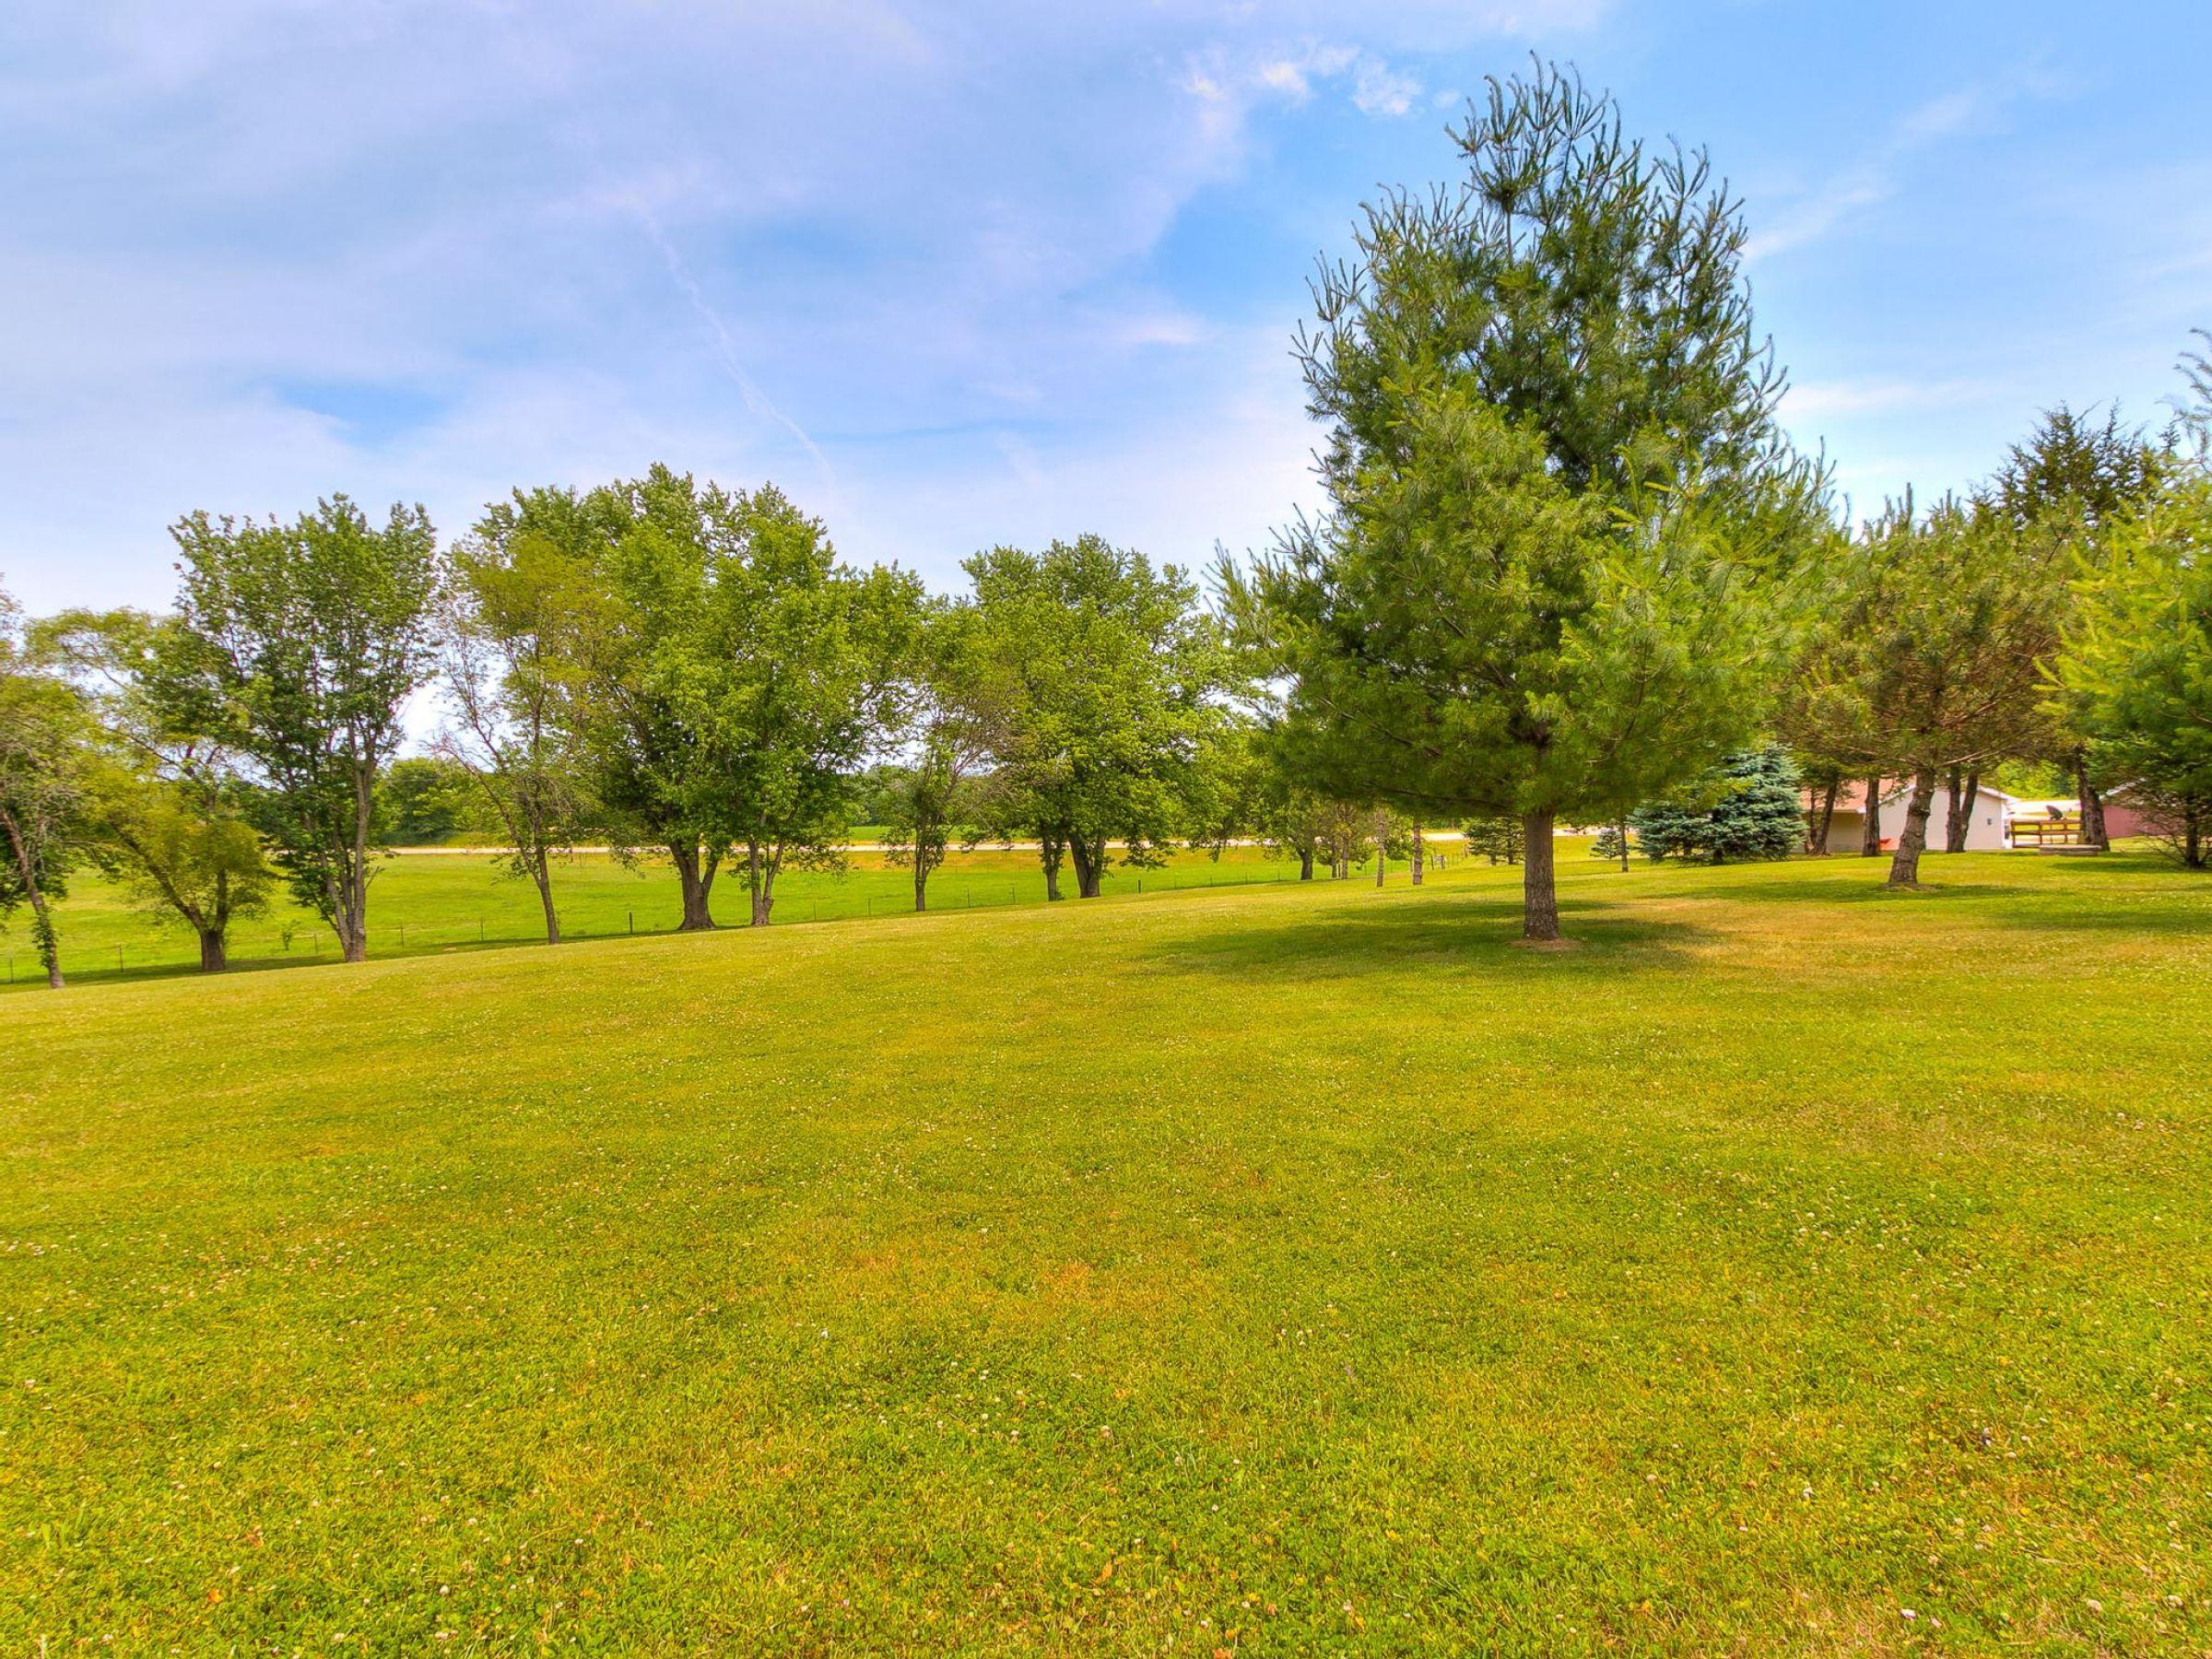 residential-warren-county-iowa-3-acres-listing-number-15593-3-2021-06-18-154700.jpg